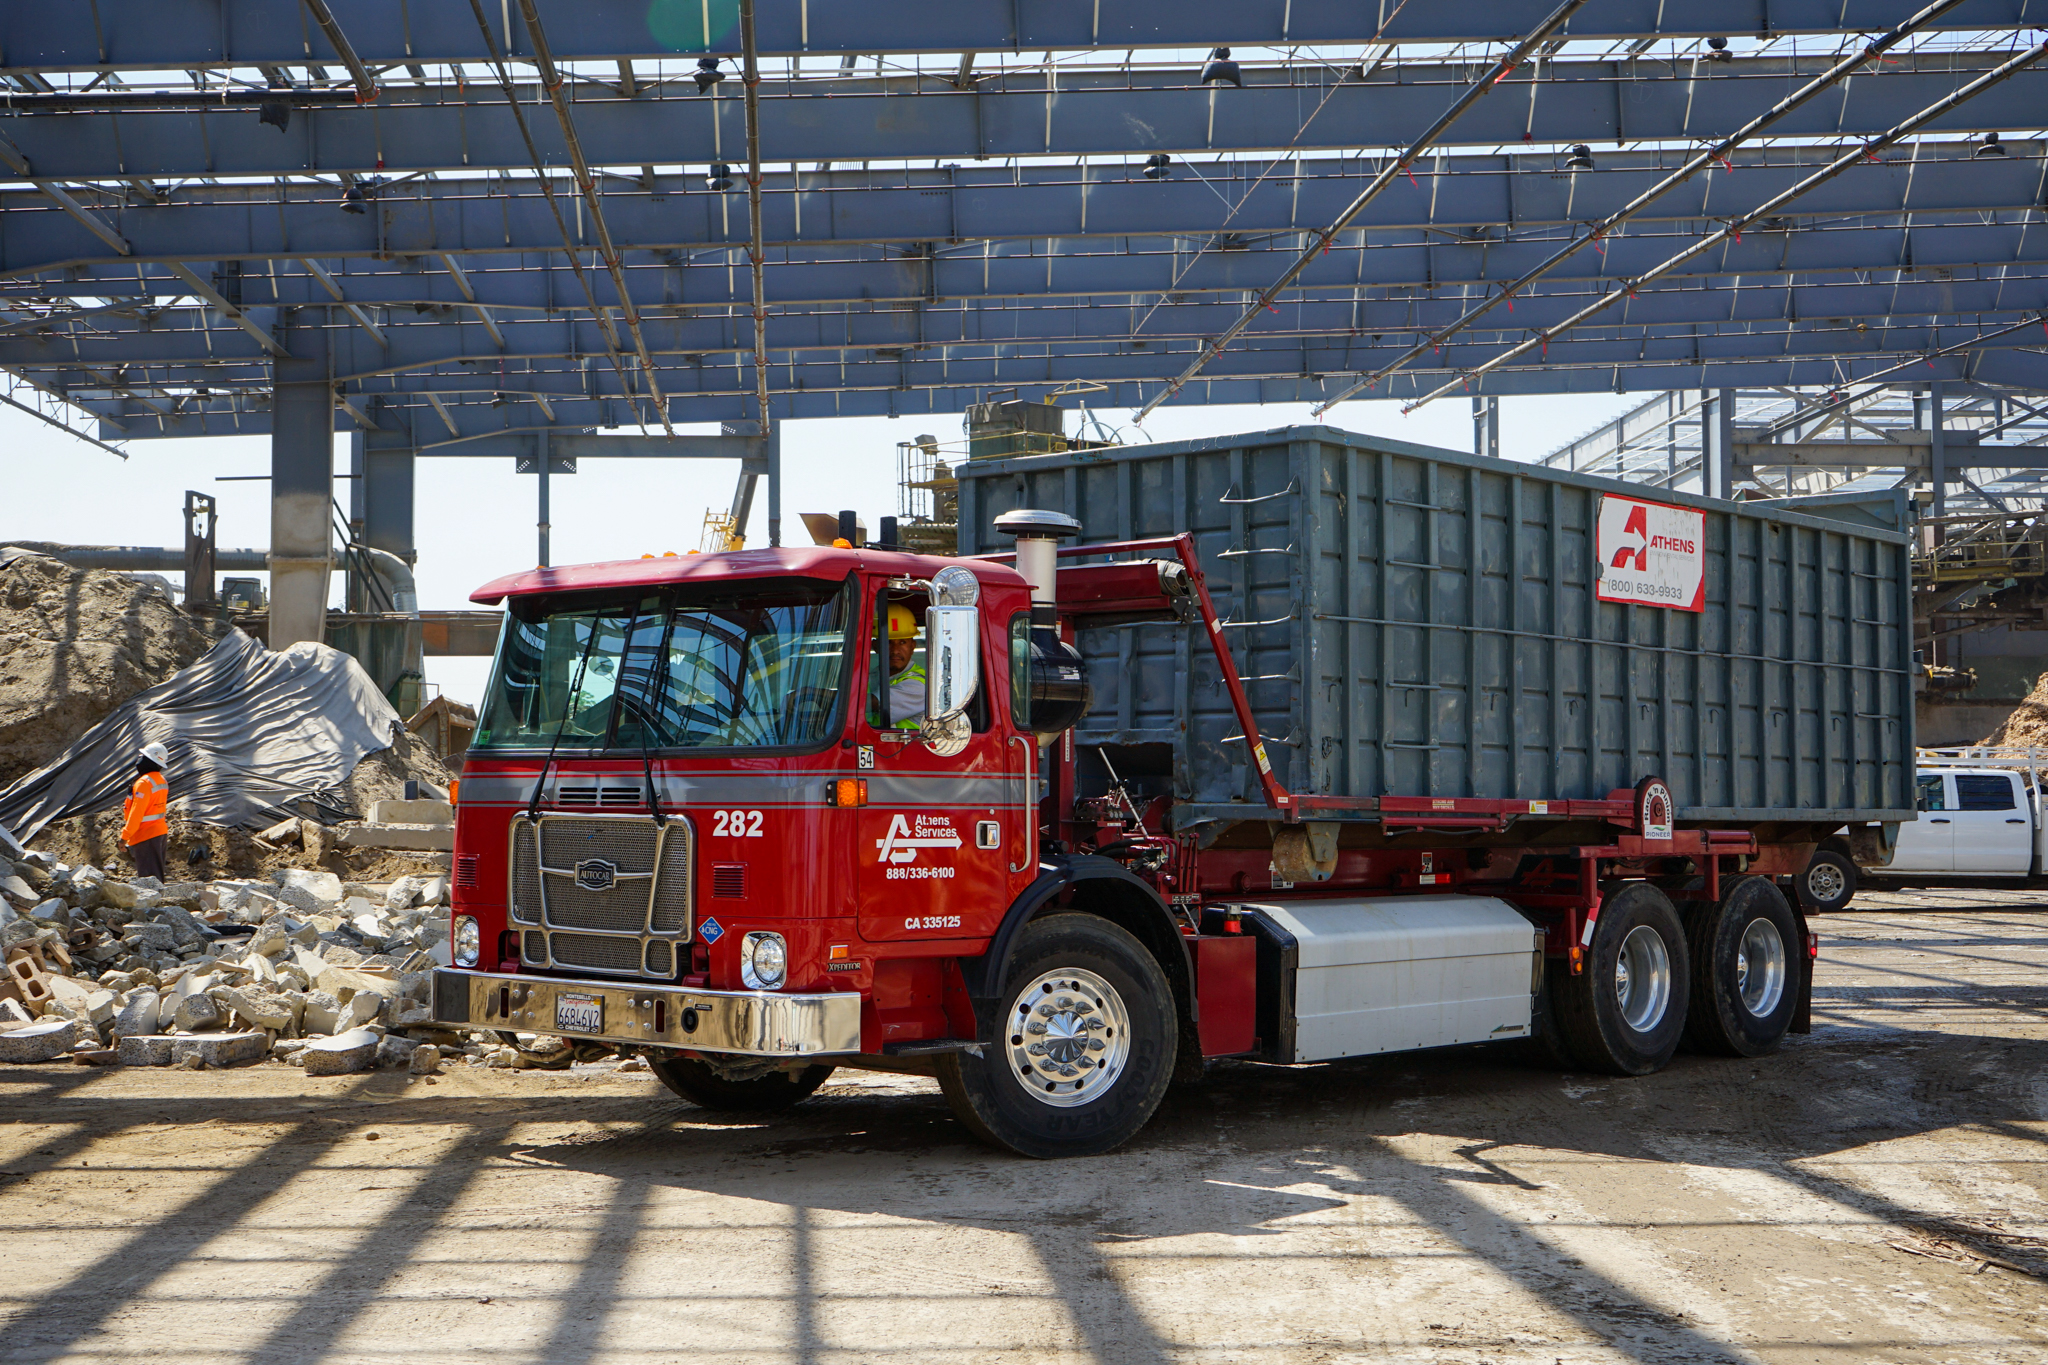 Remodeling Waste Diversion in L. A.